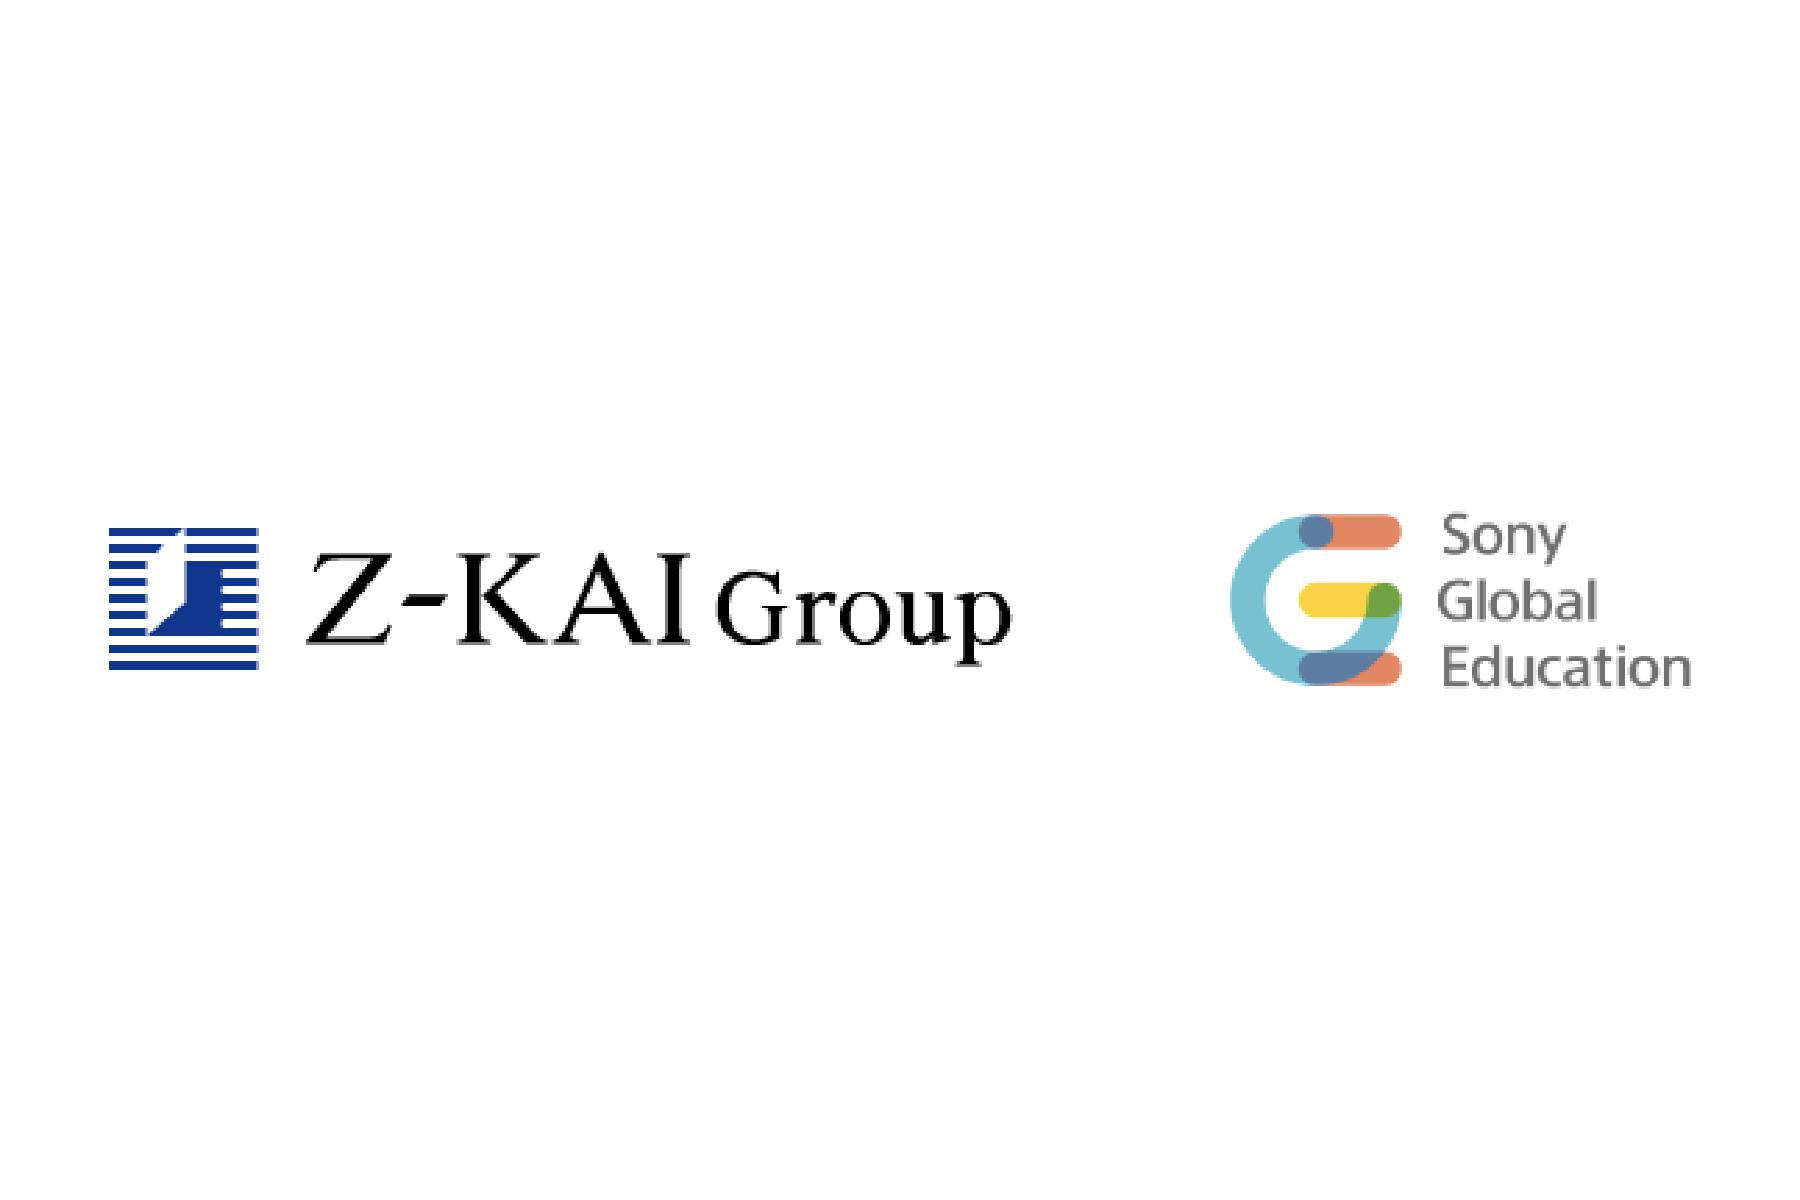 Z会グループ×ソニー・グローバルエデュケーション | 教育事業で包括的な業務提携契約を締結